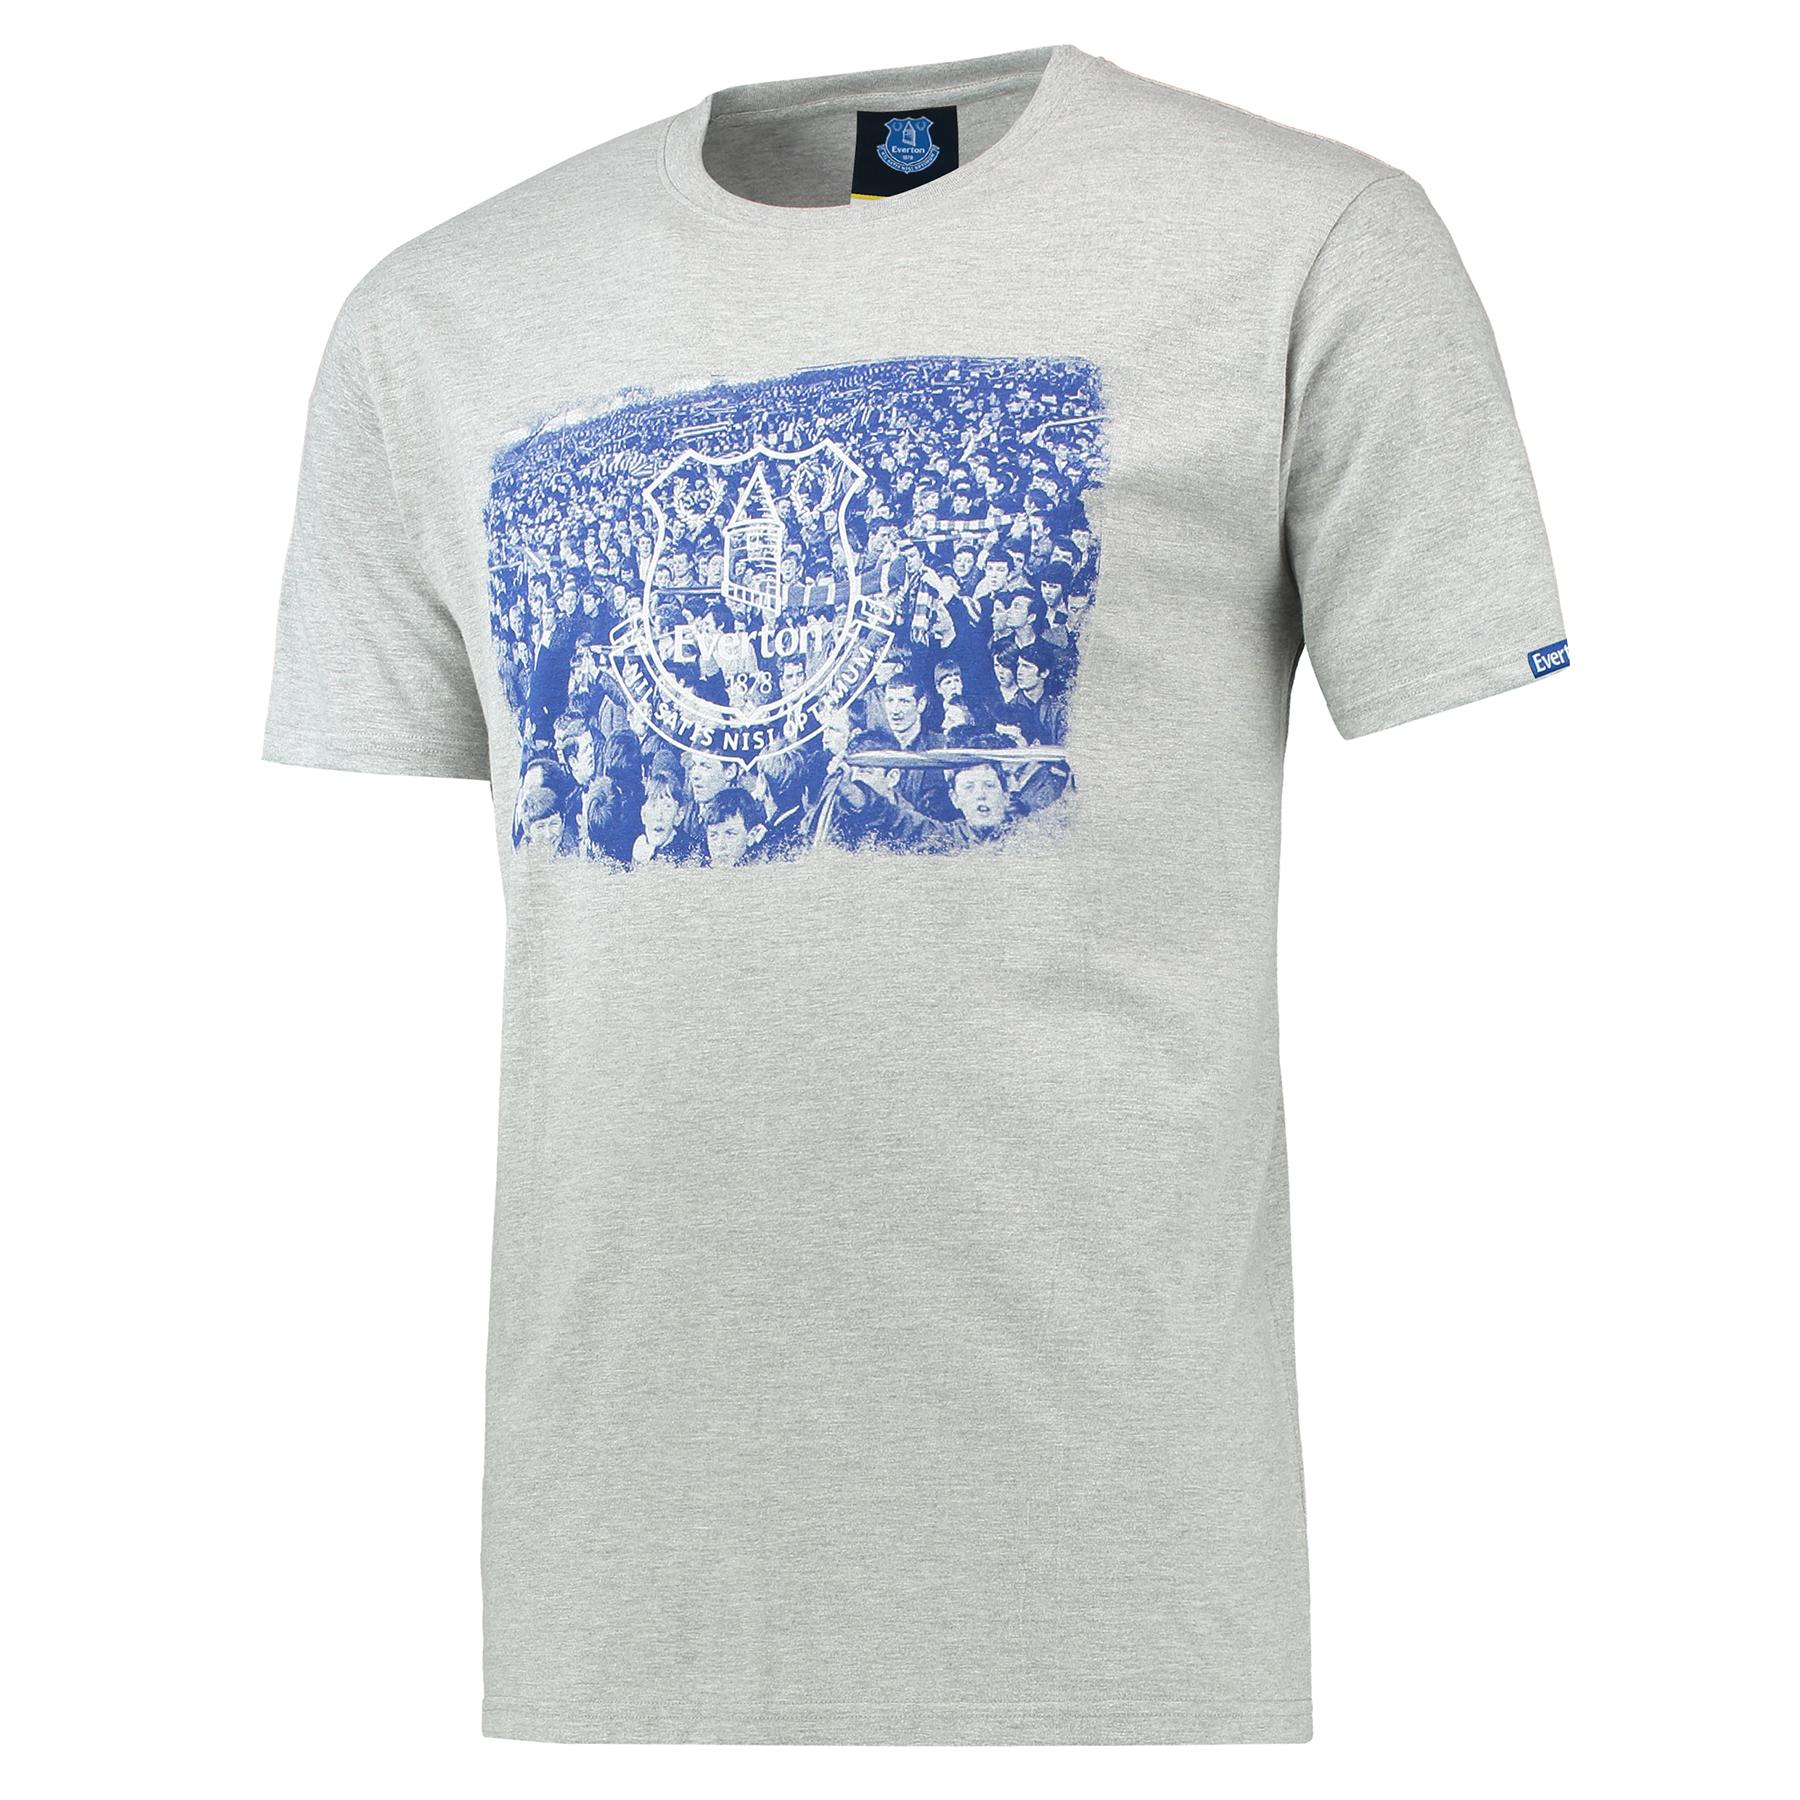 Everton Royal Crowd T-Shirt - Grey Marl